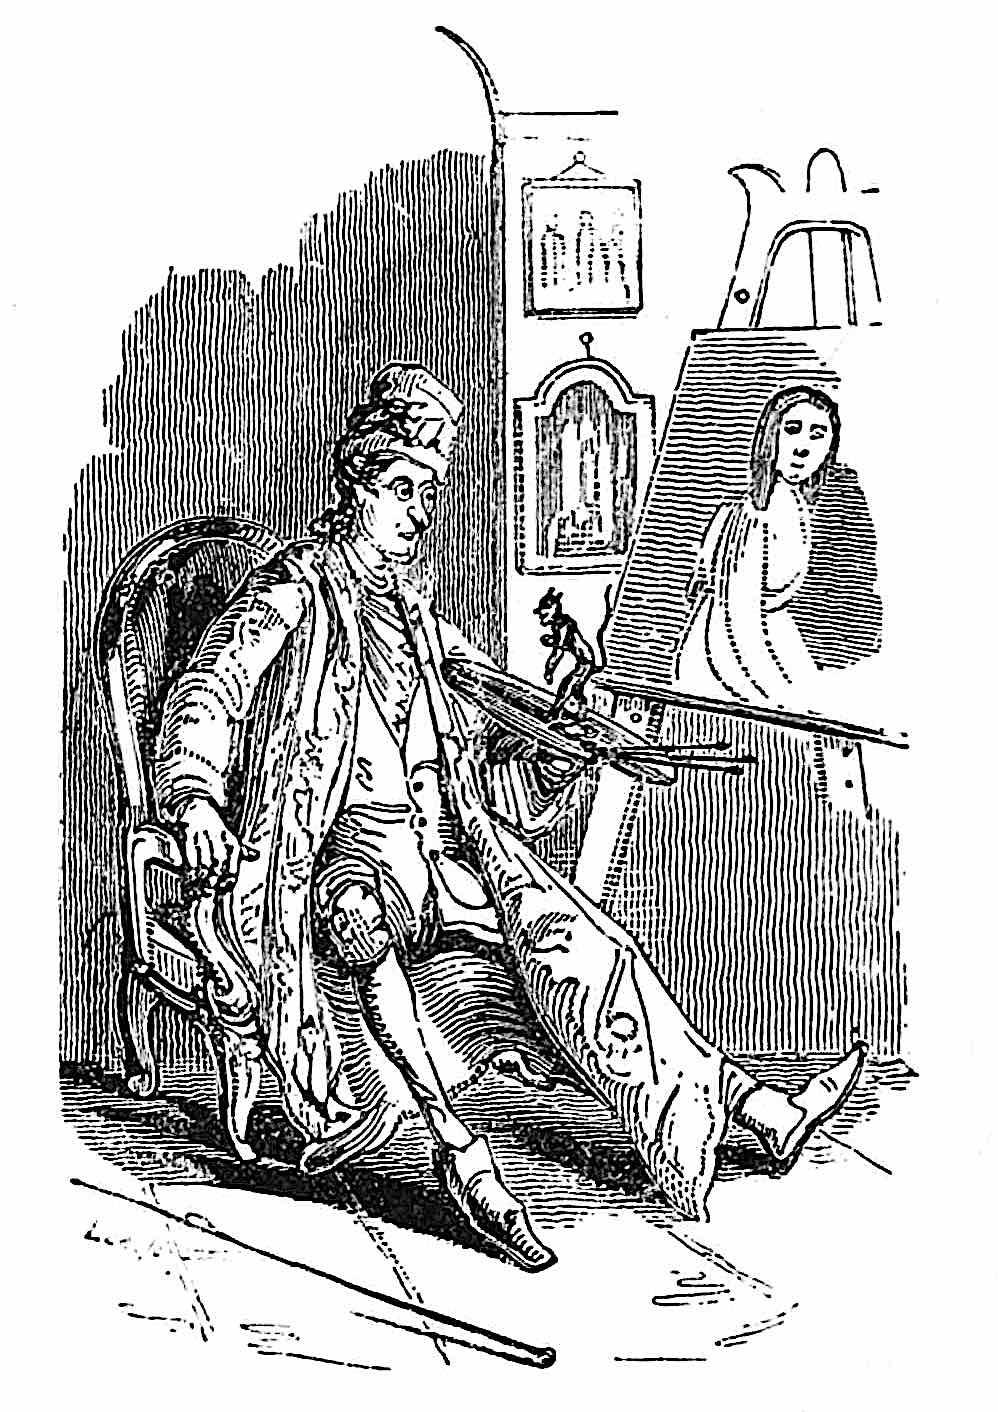 William Makepeace Thackeray, an artist's devil